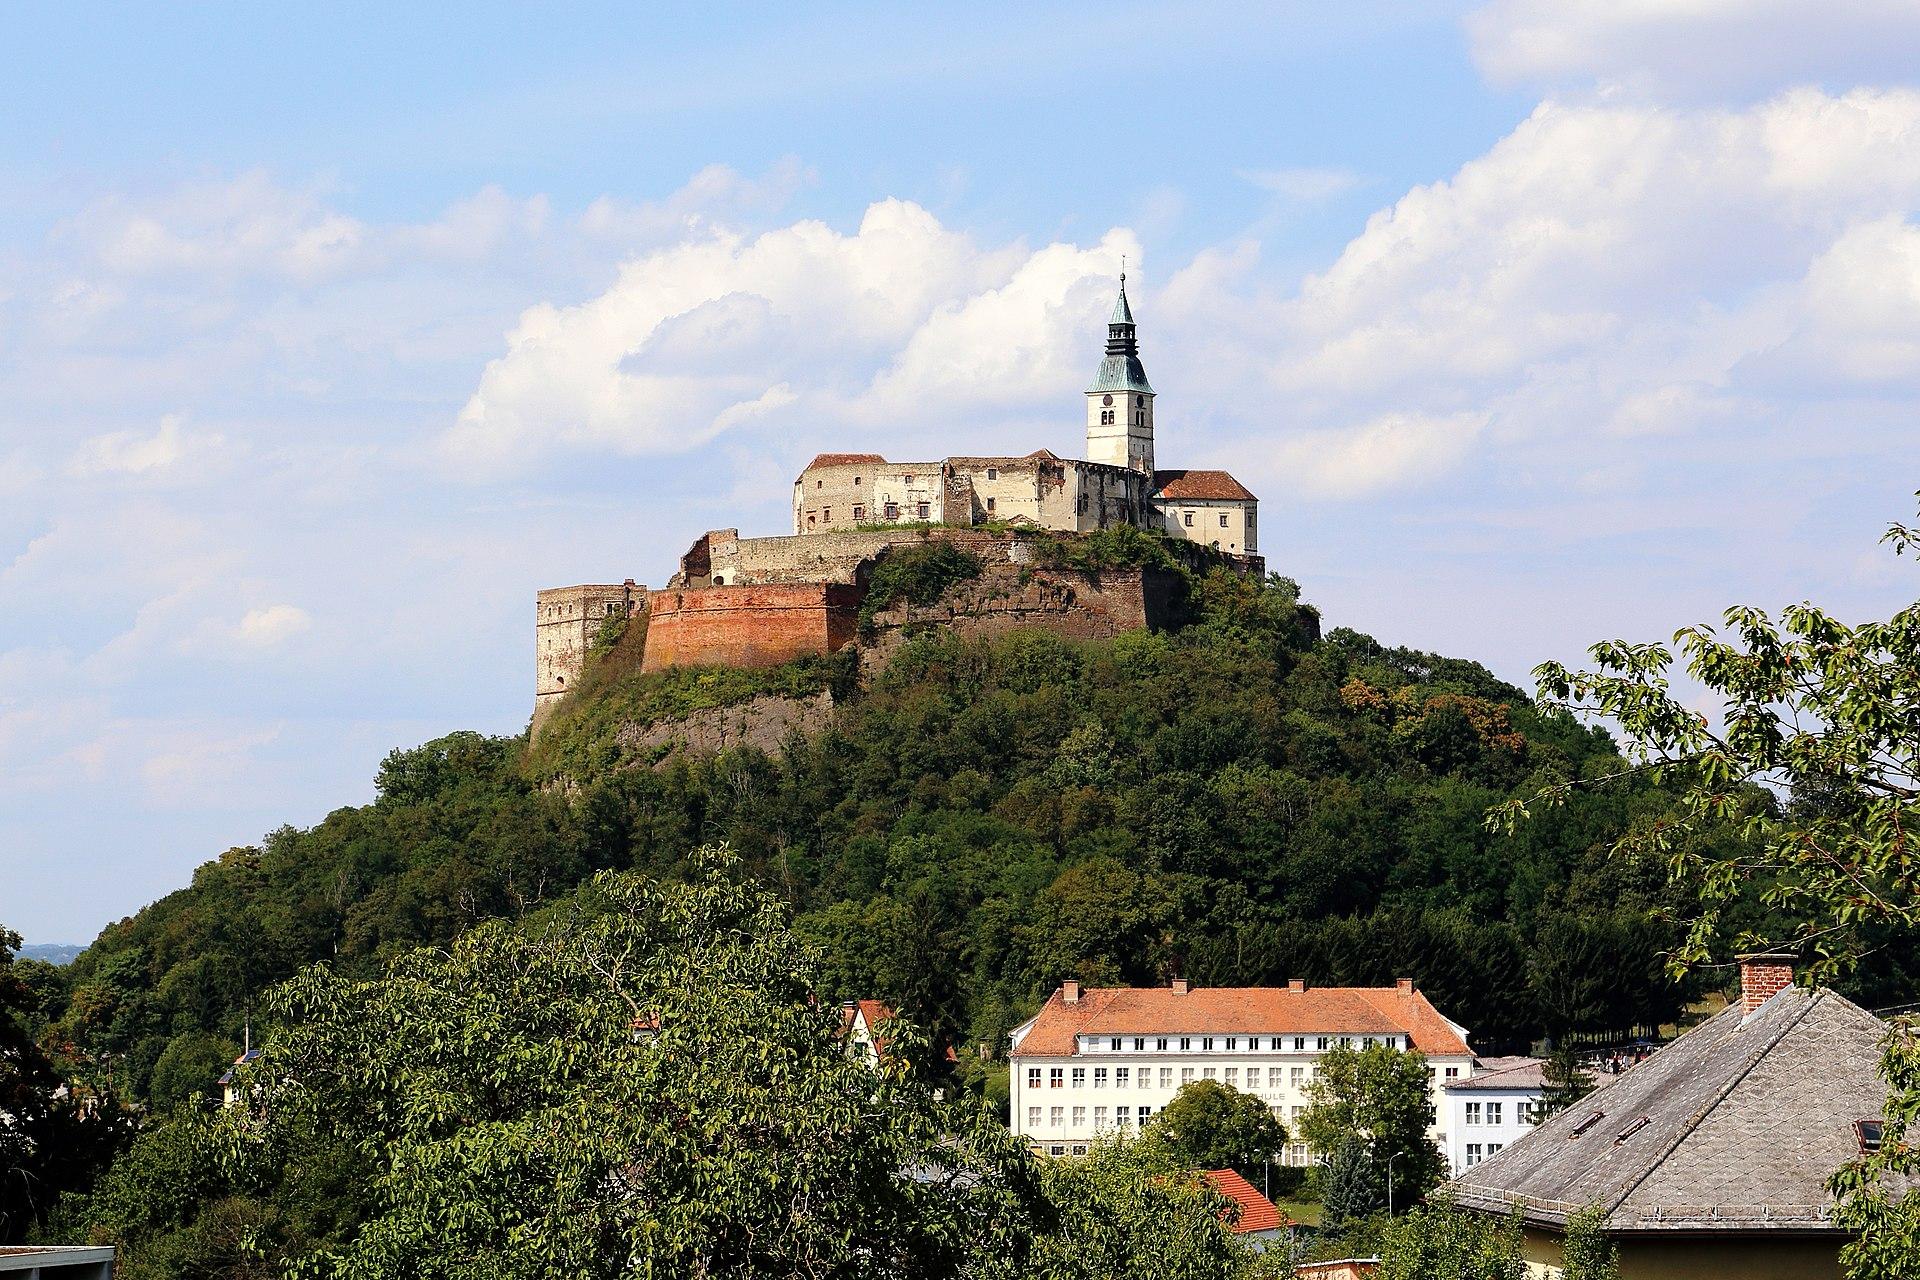 Burg Güssing - Wikipedia